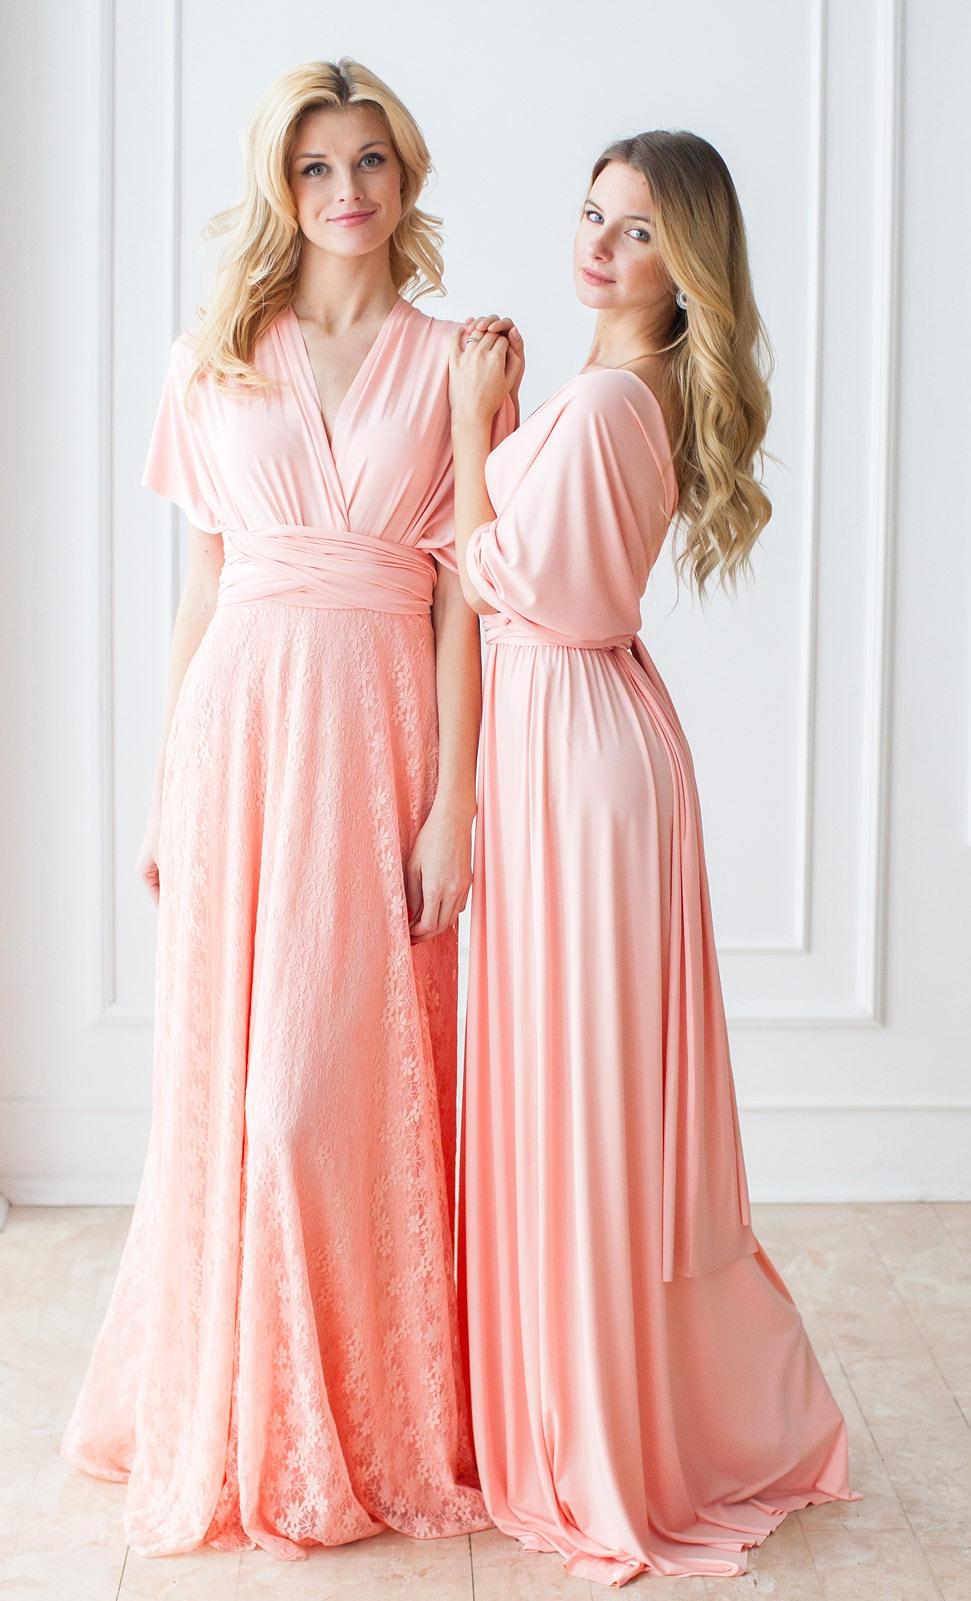 Pastel Peach Bridesmaid Dress Peach Coral Convertible   Etsy